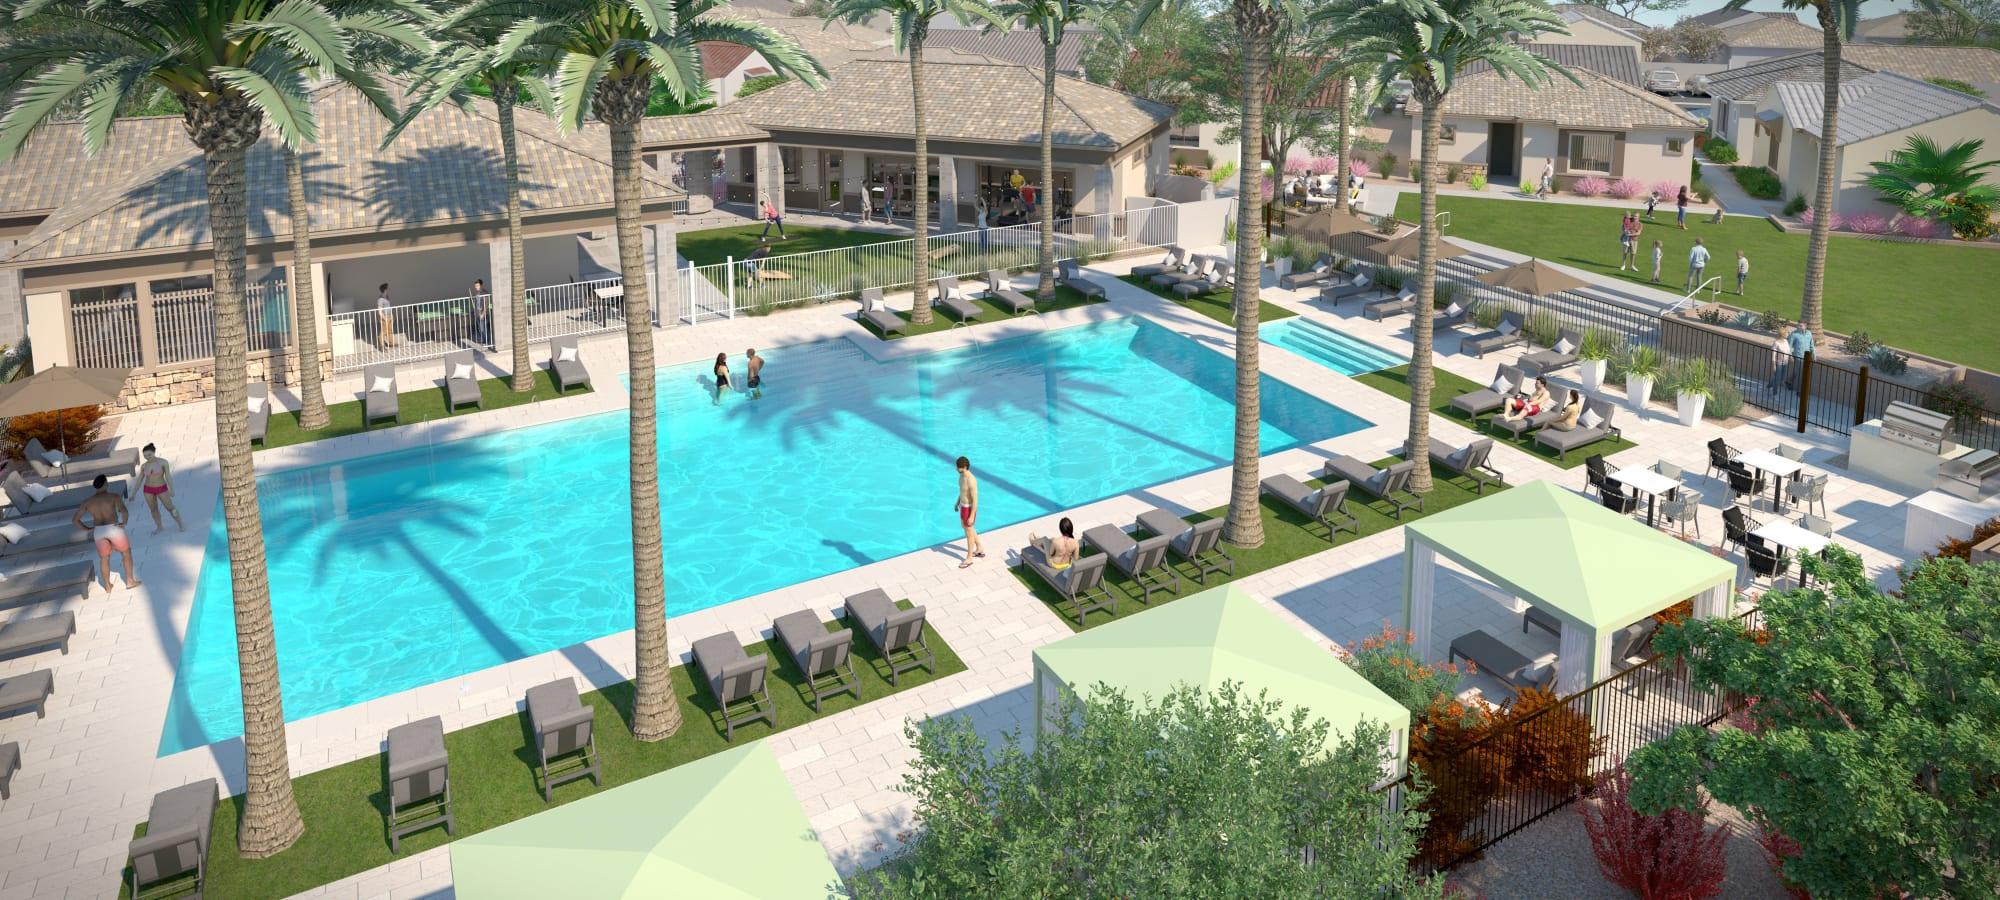 Luxury amenity spaces at Tavalo at Cadence in Mesa, Arizona